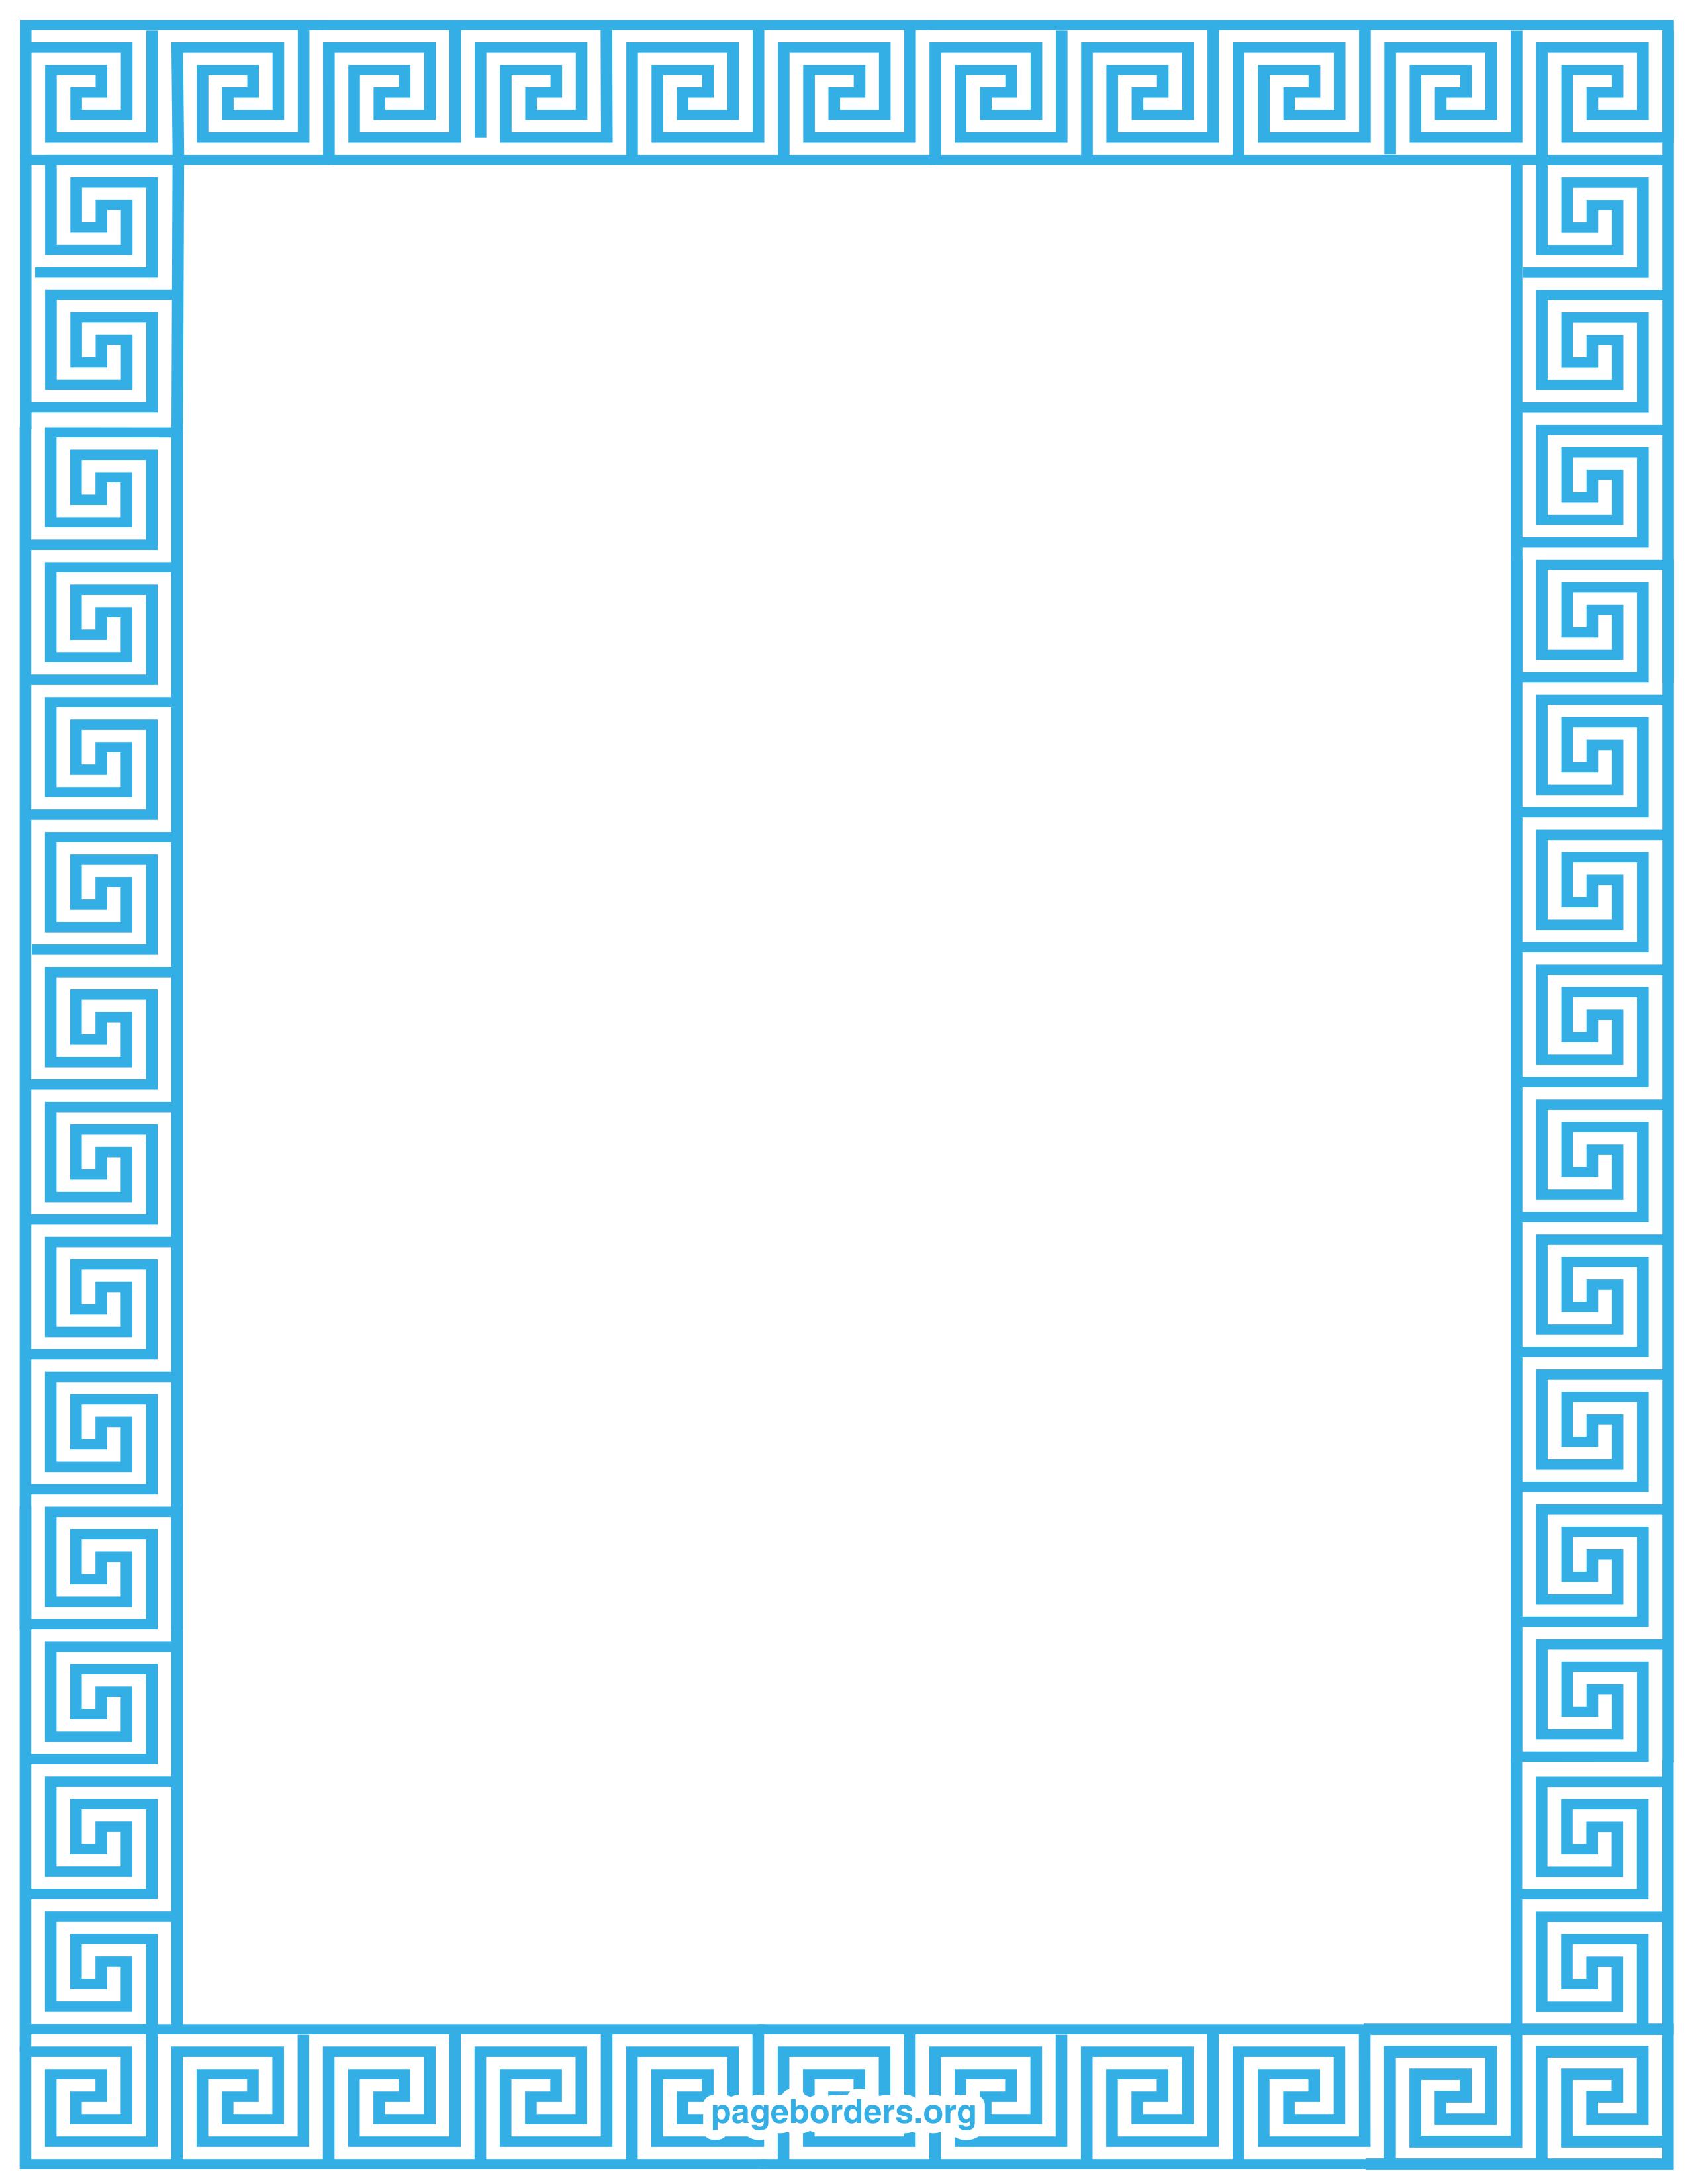 Greek key border clipart svg transparent stock Greek key border clip art - ClipartFest svg transparent stock